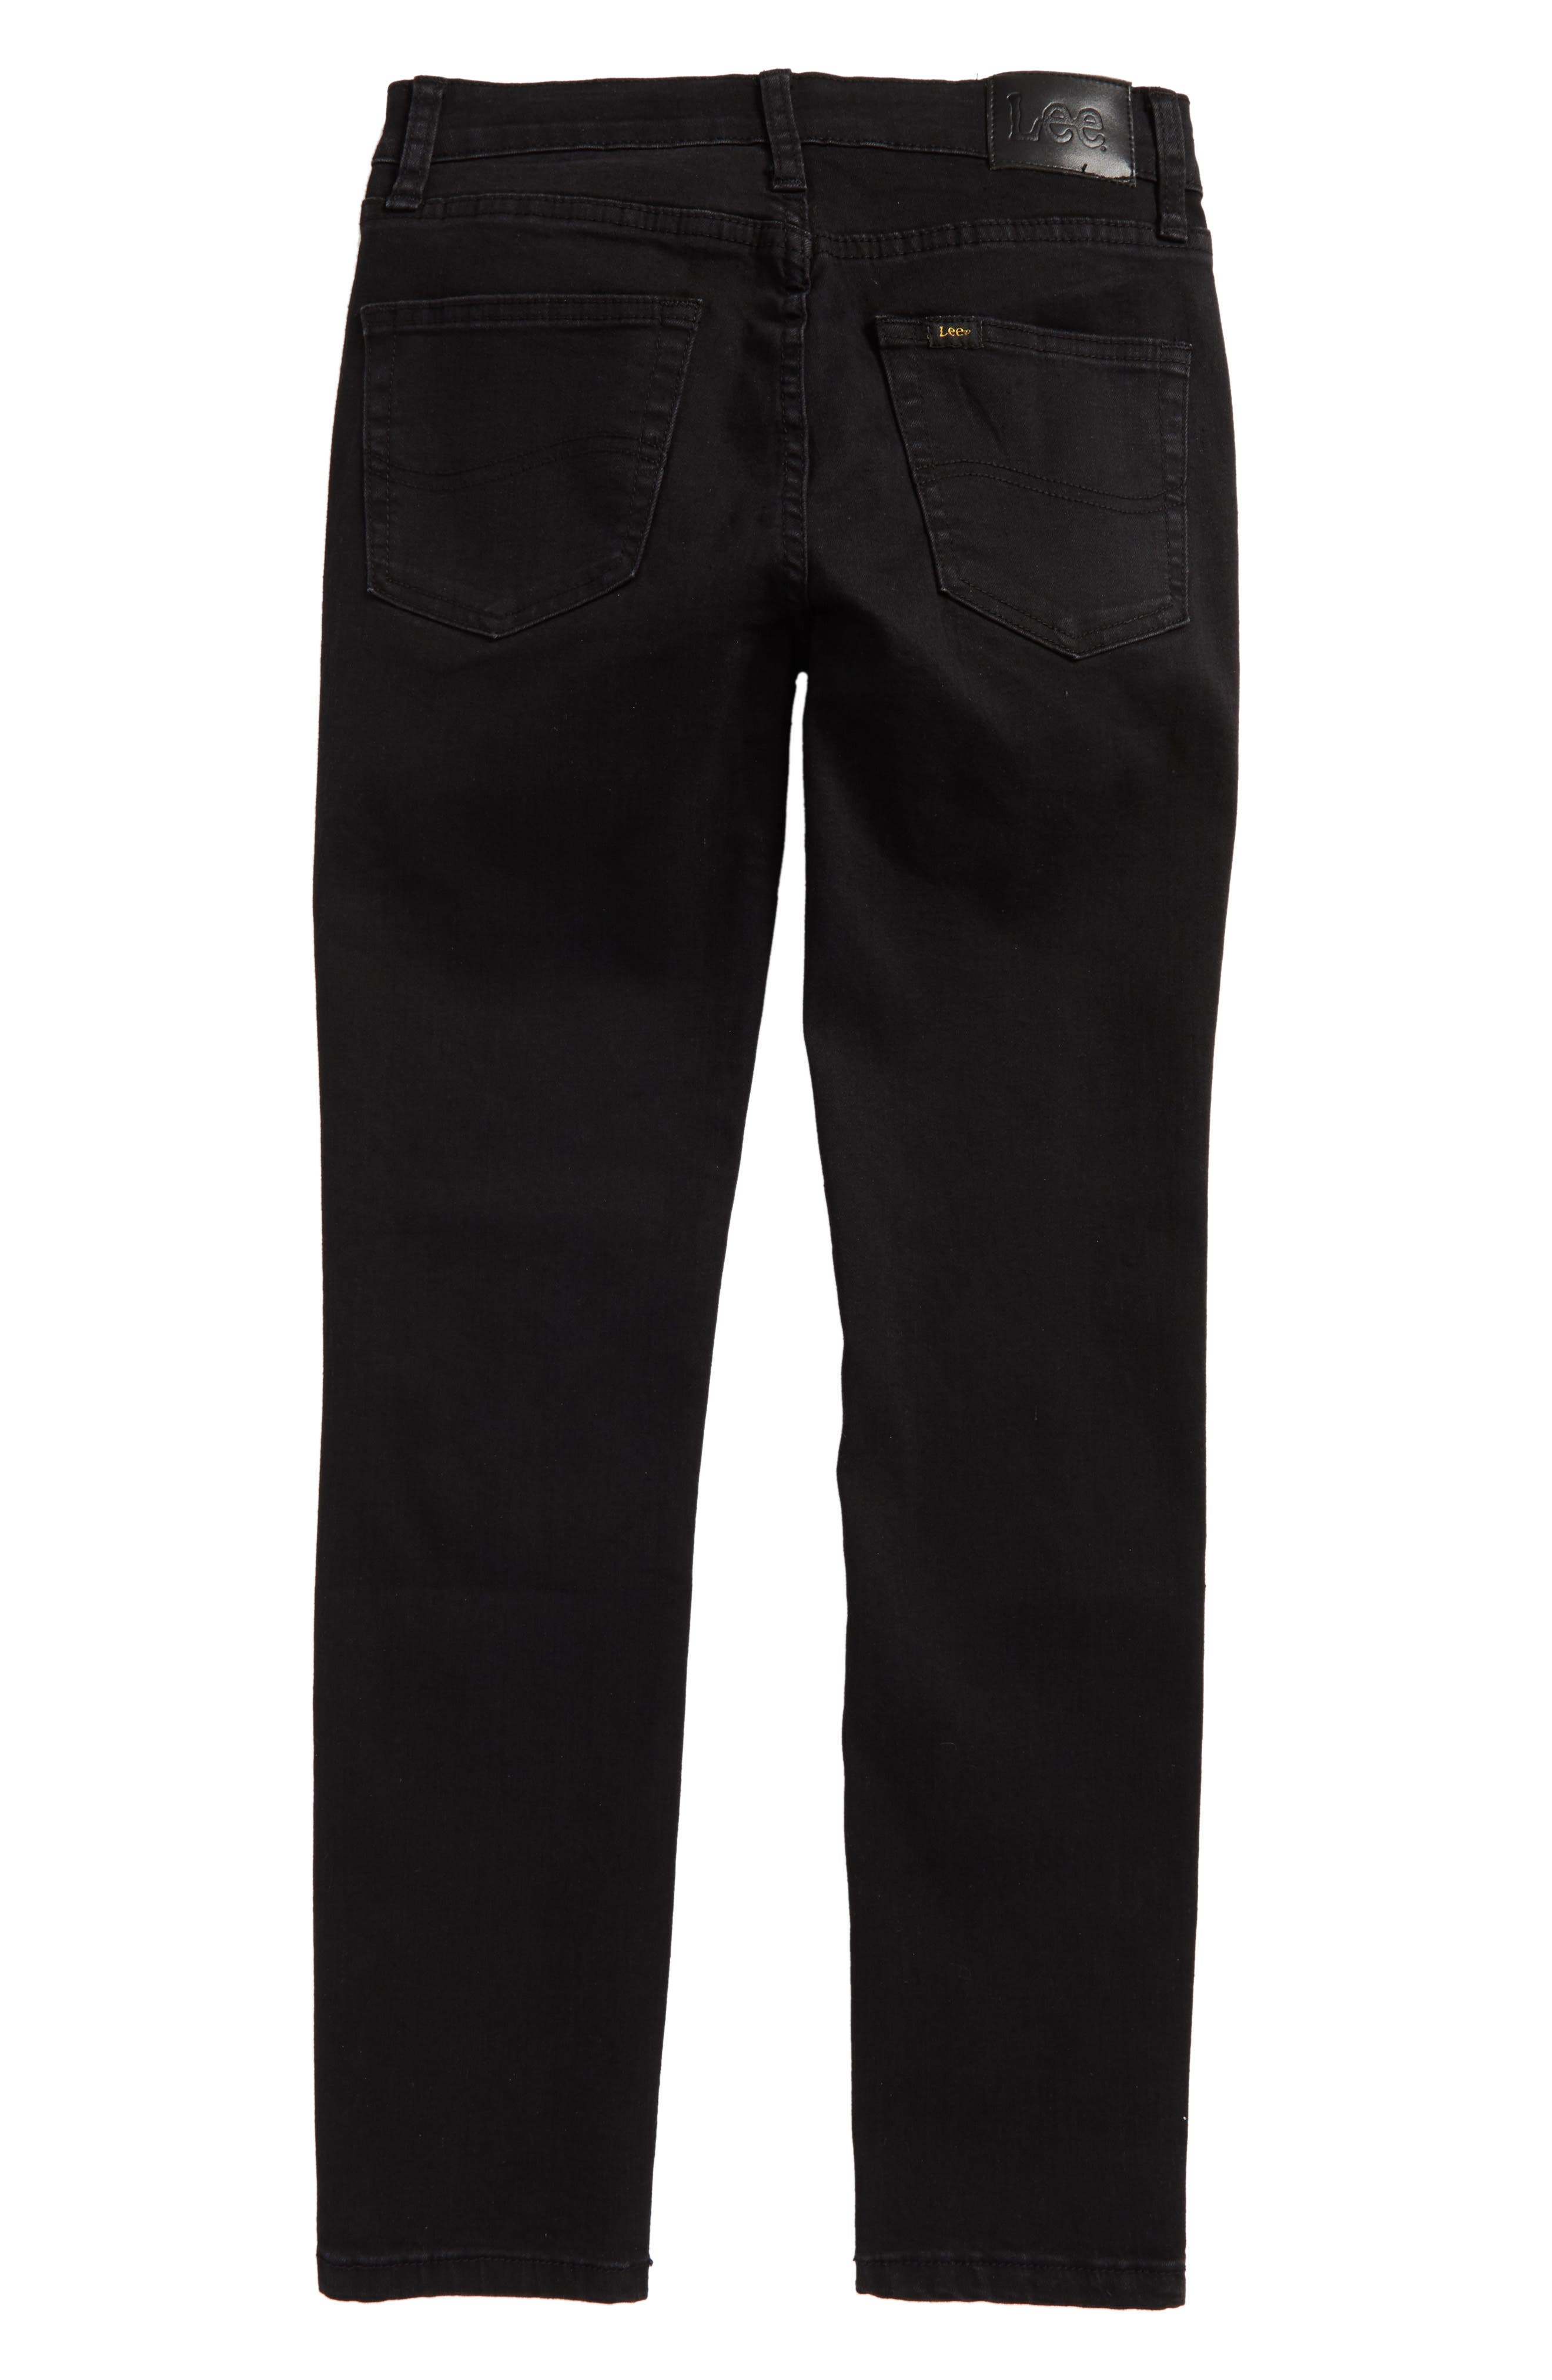 Stretch Skinny Jeans,                             Alternate thumbnail 2, color,                             Jet